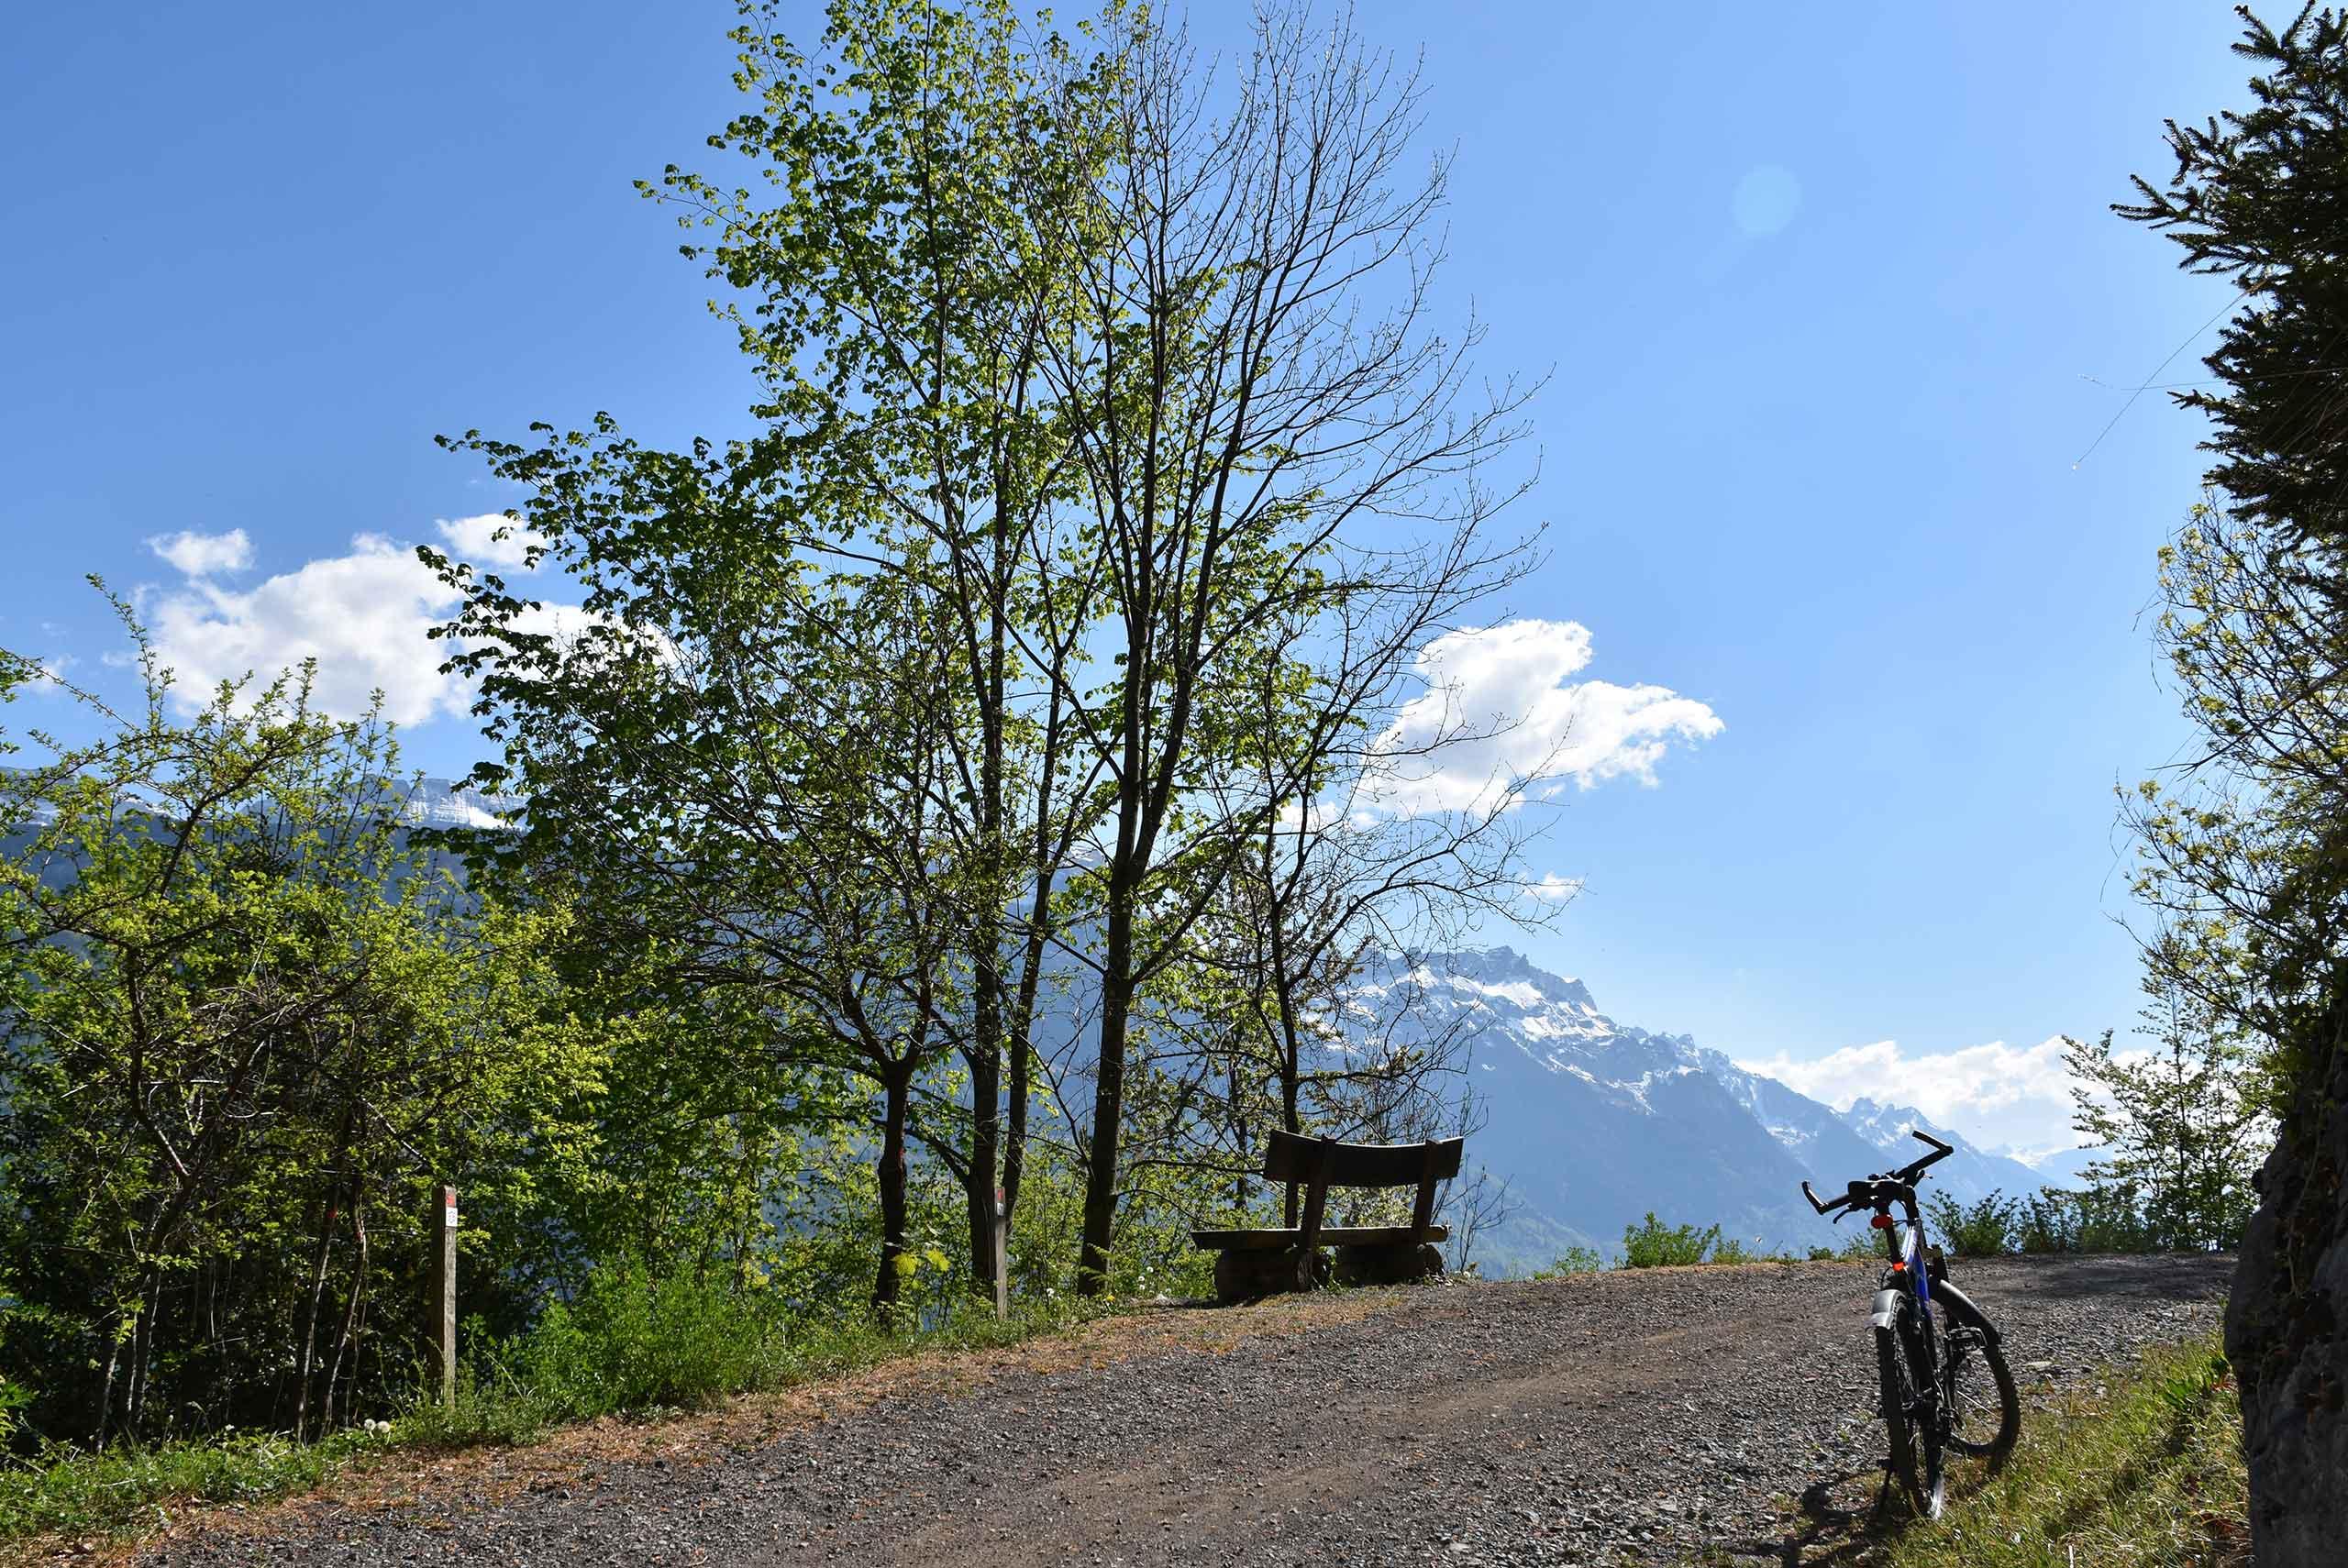 wanderweg-bikeweg-brienz-ebligen-haengebruecke-oberried.jpg